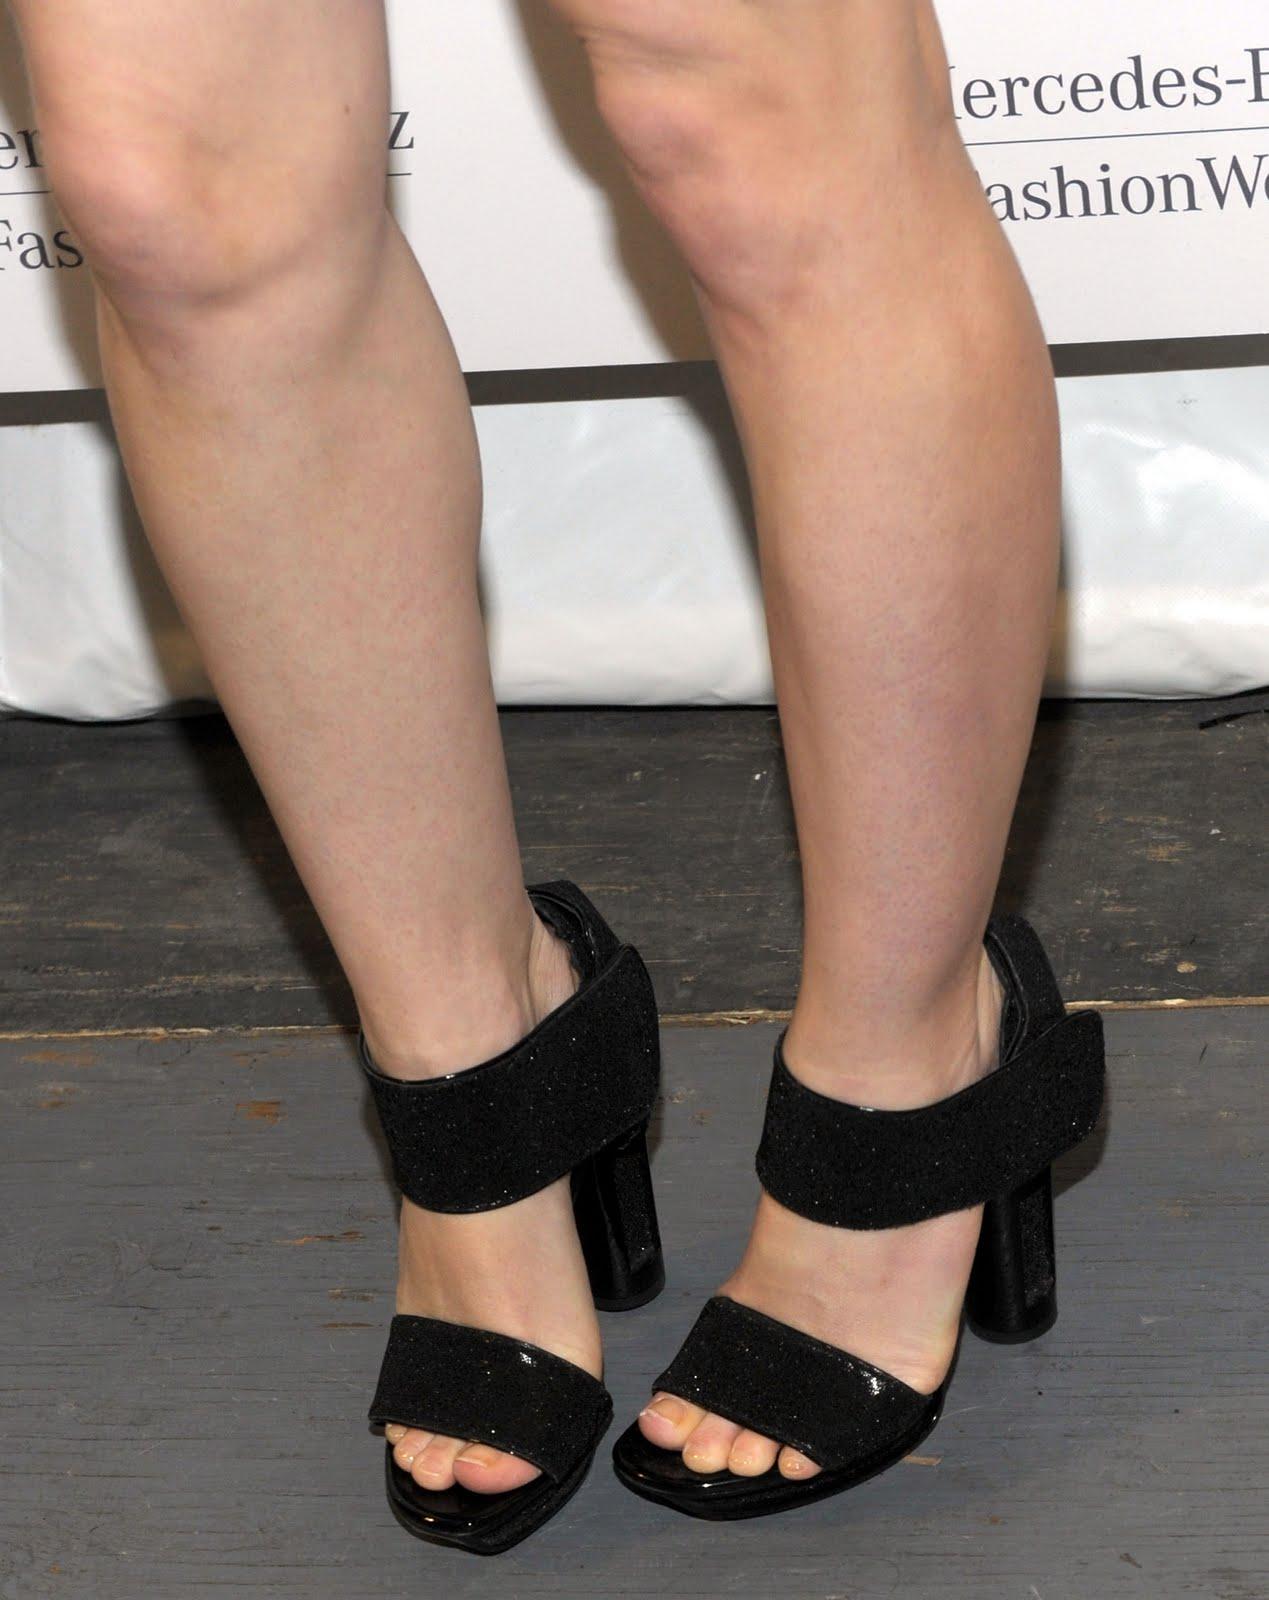 Feet Marlene Favela nudes (19 photo), Topless, Bikini, Twitter, bra 2017